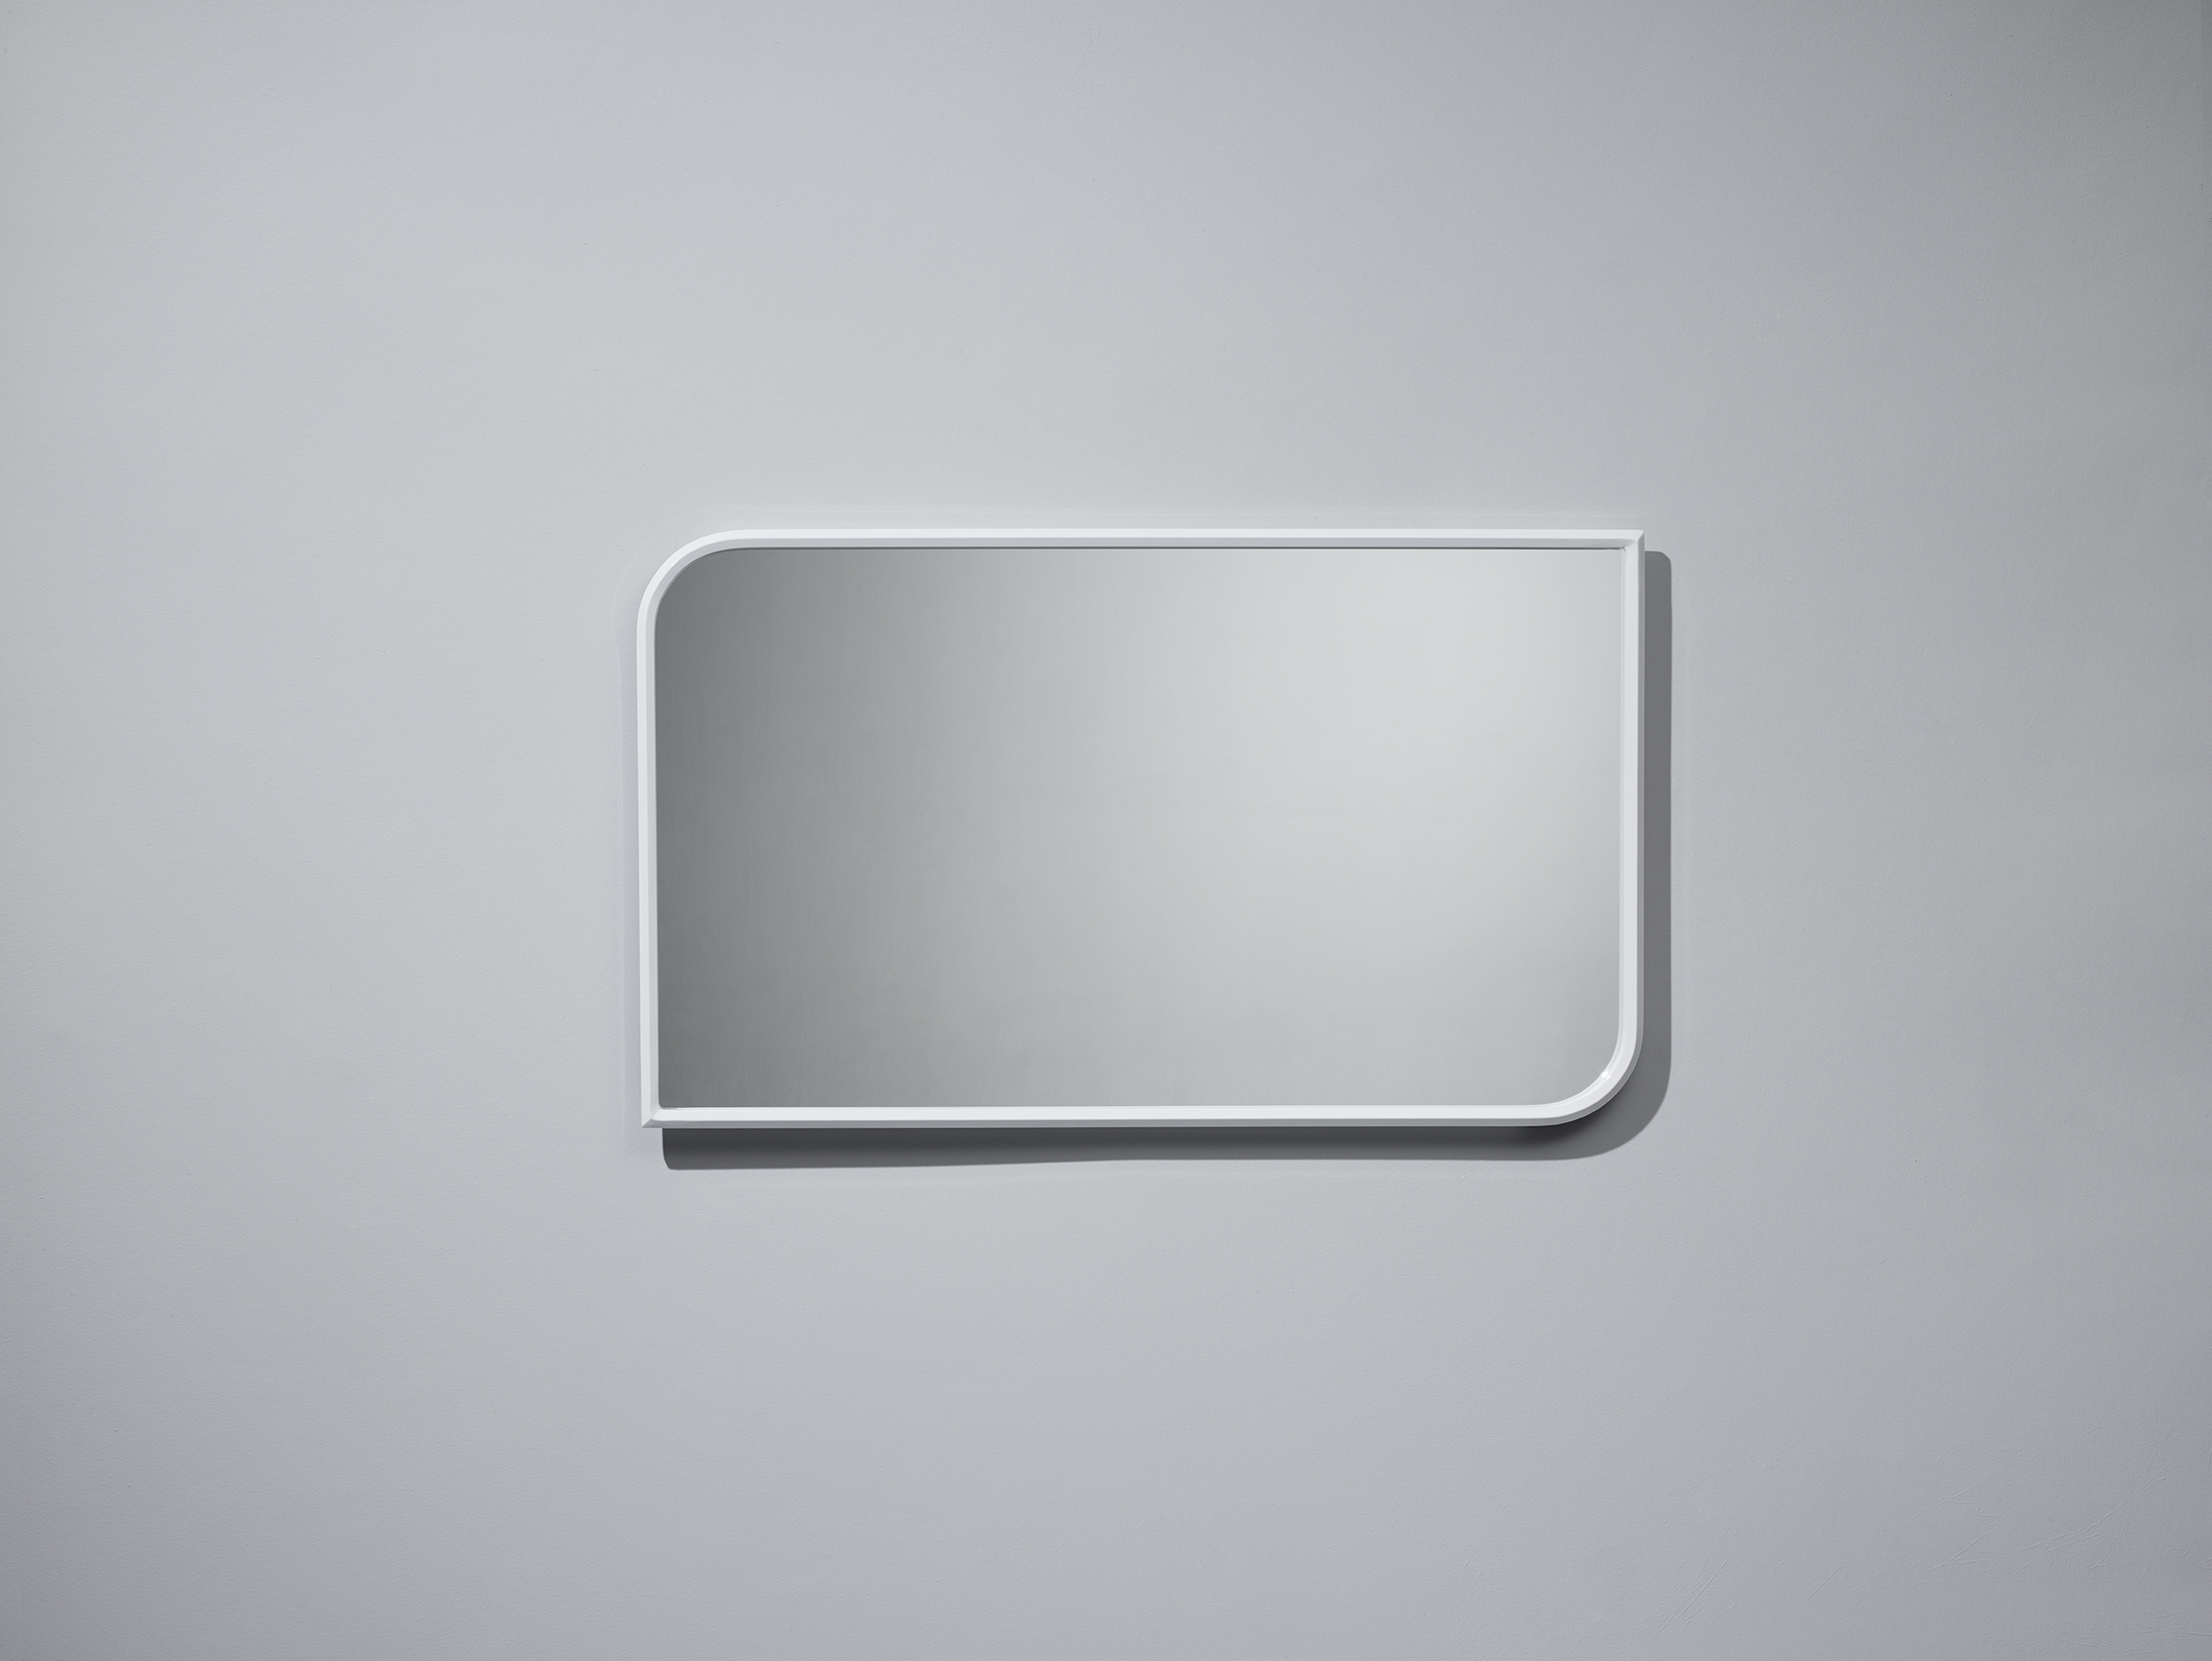 DoubleCurve_Mirror_Horizontal_COMP_Oa_2500pxl.jpg